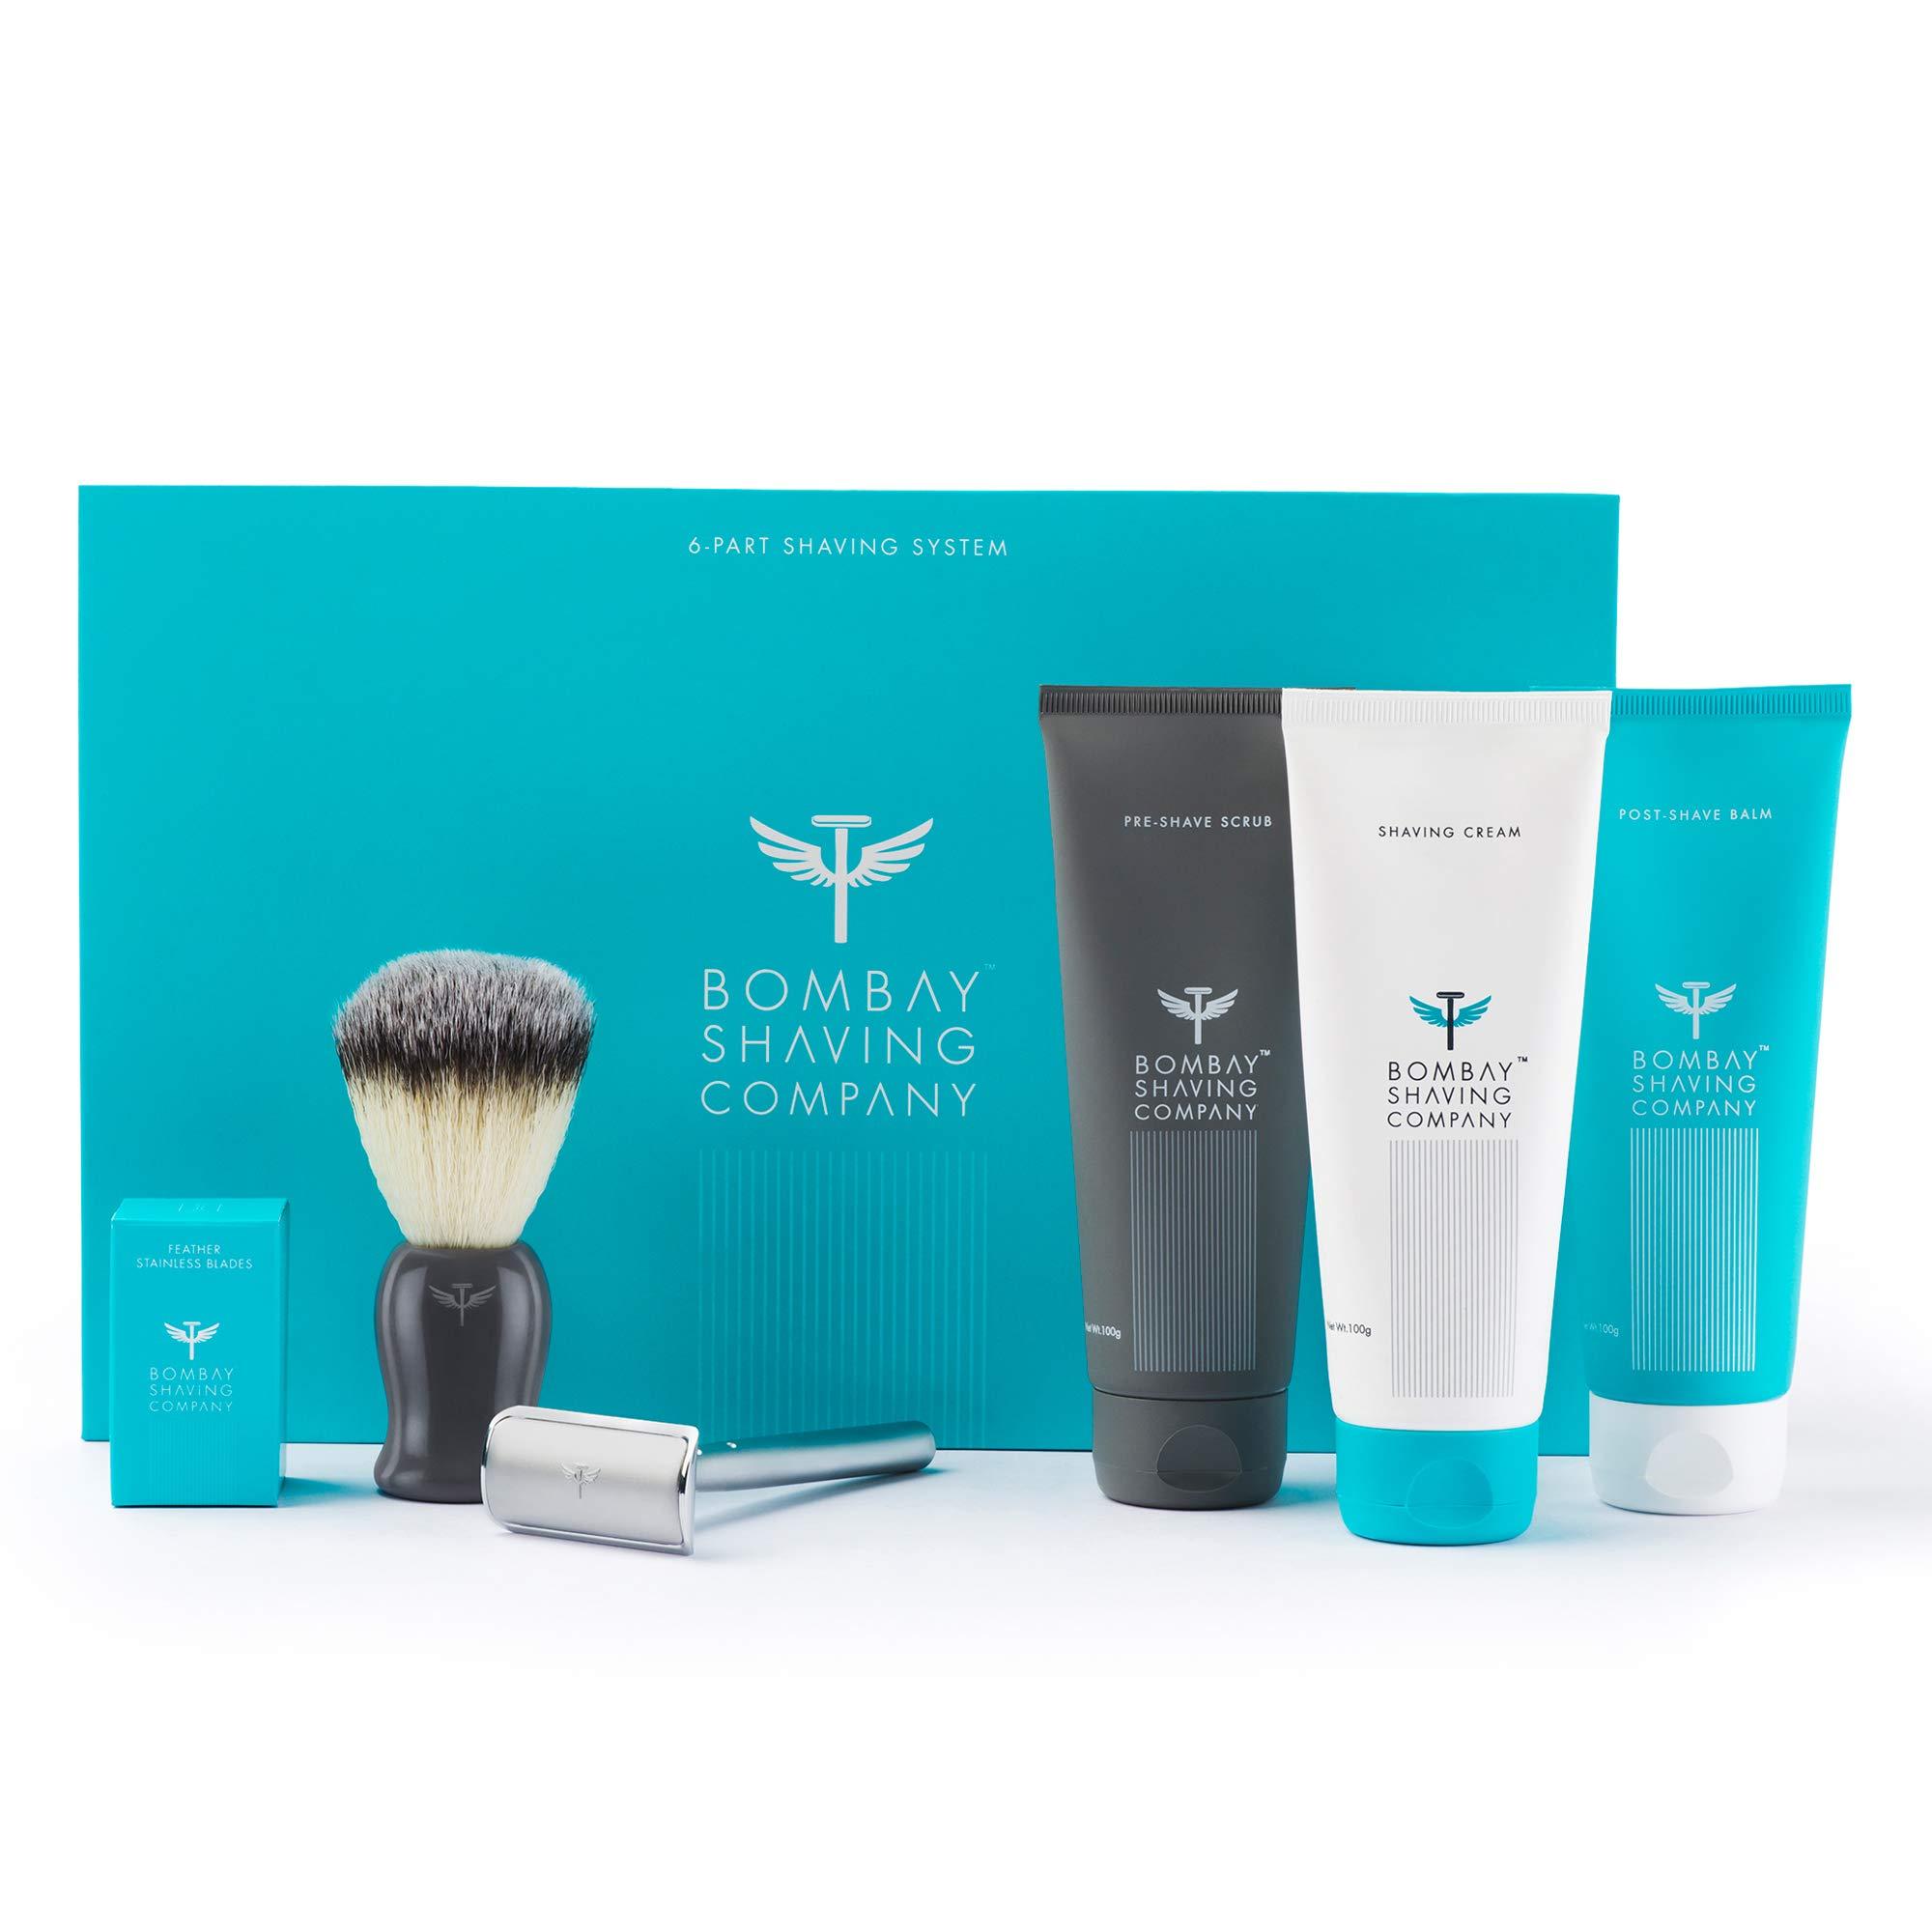 Bombay Shaving Company Complete Shaving Kit (Safety Razor, Blades, Imitation Badger Brush, Scrub, Cream, Balm)   Gift for Men